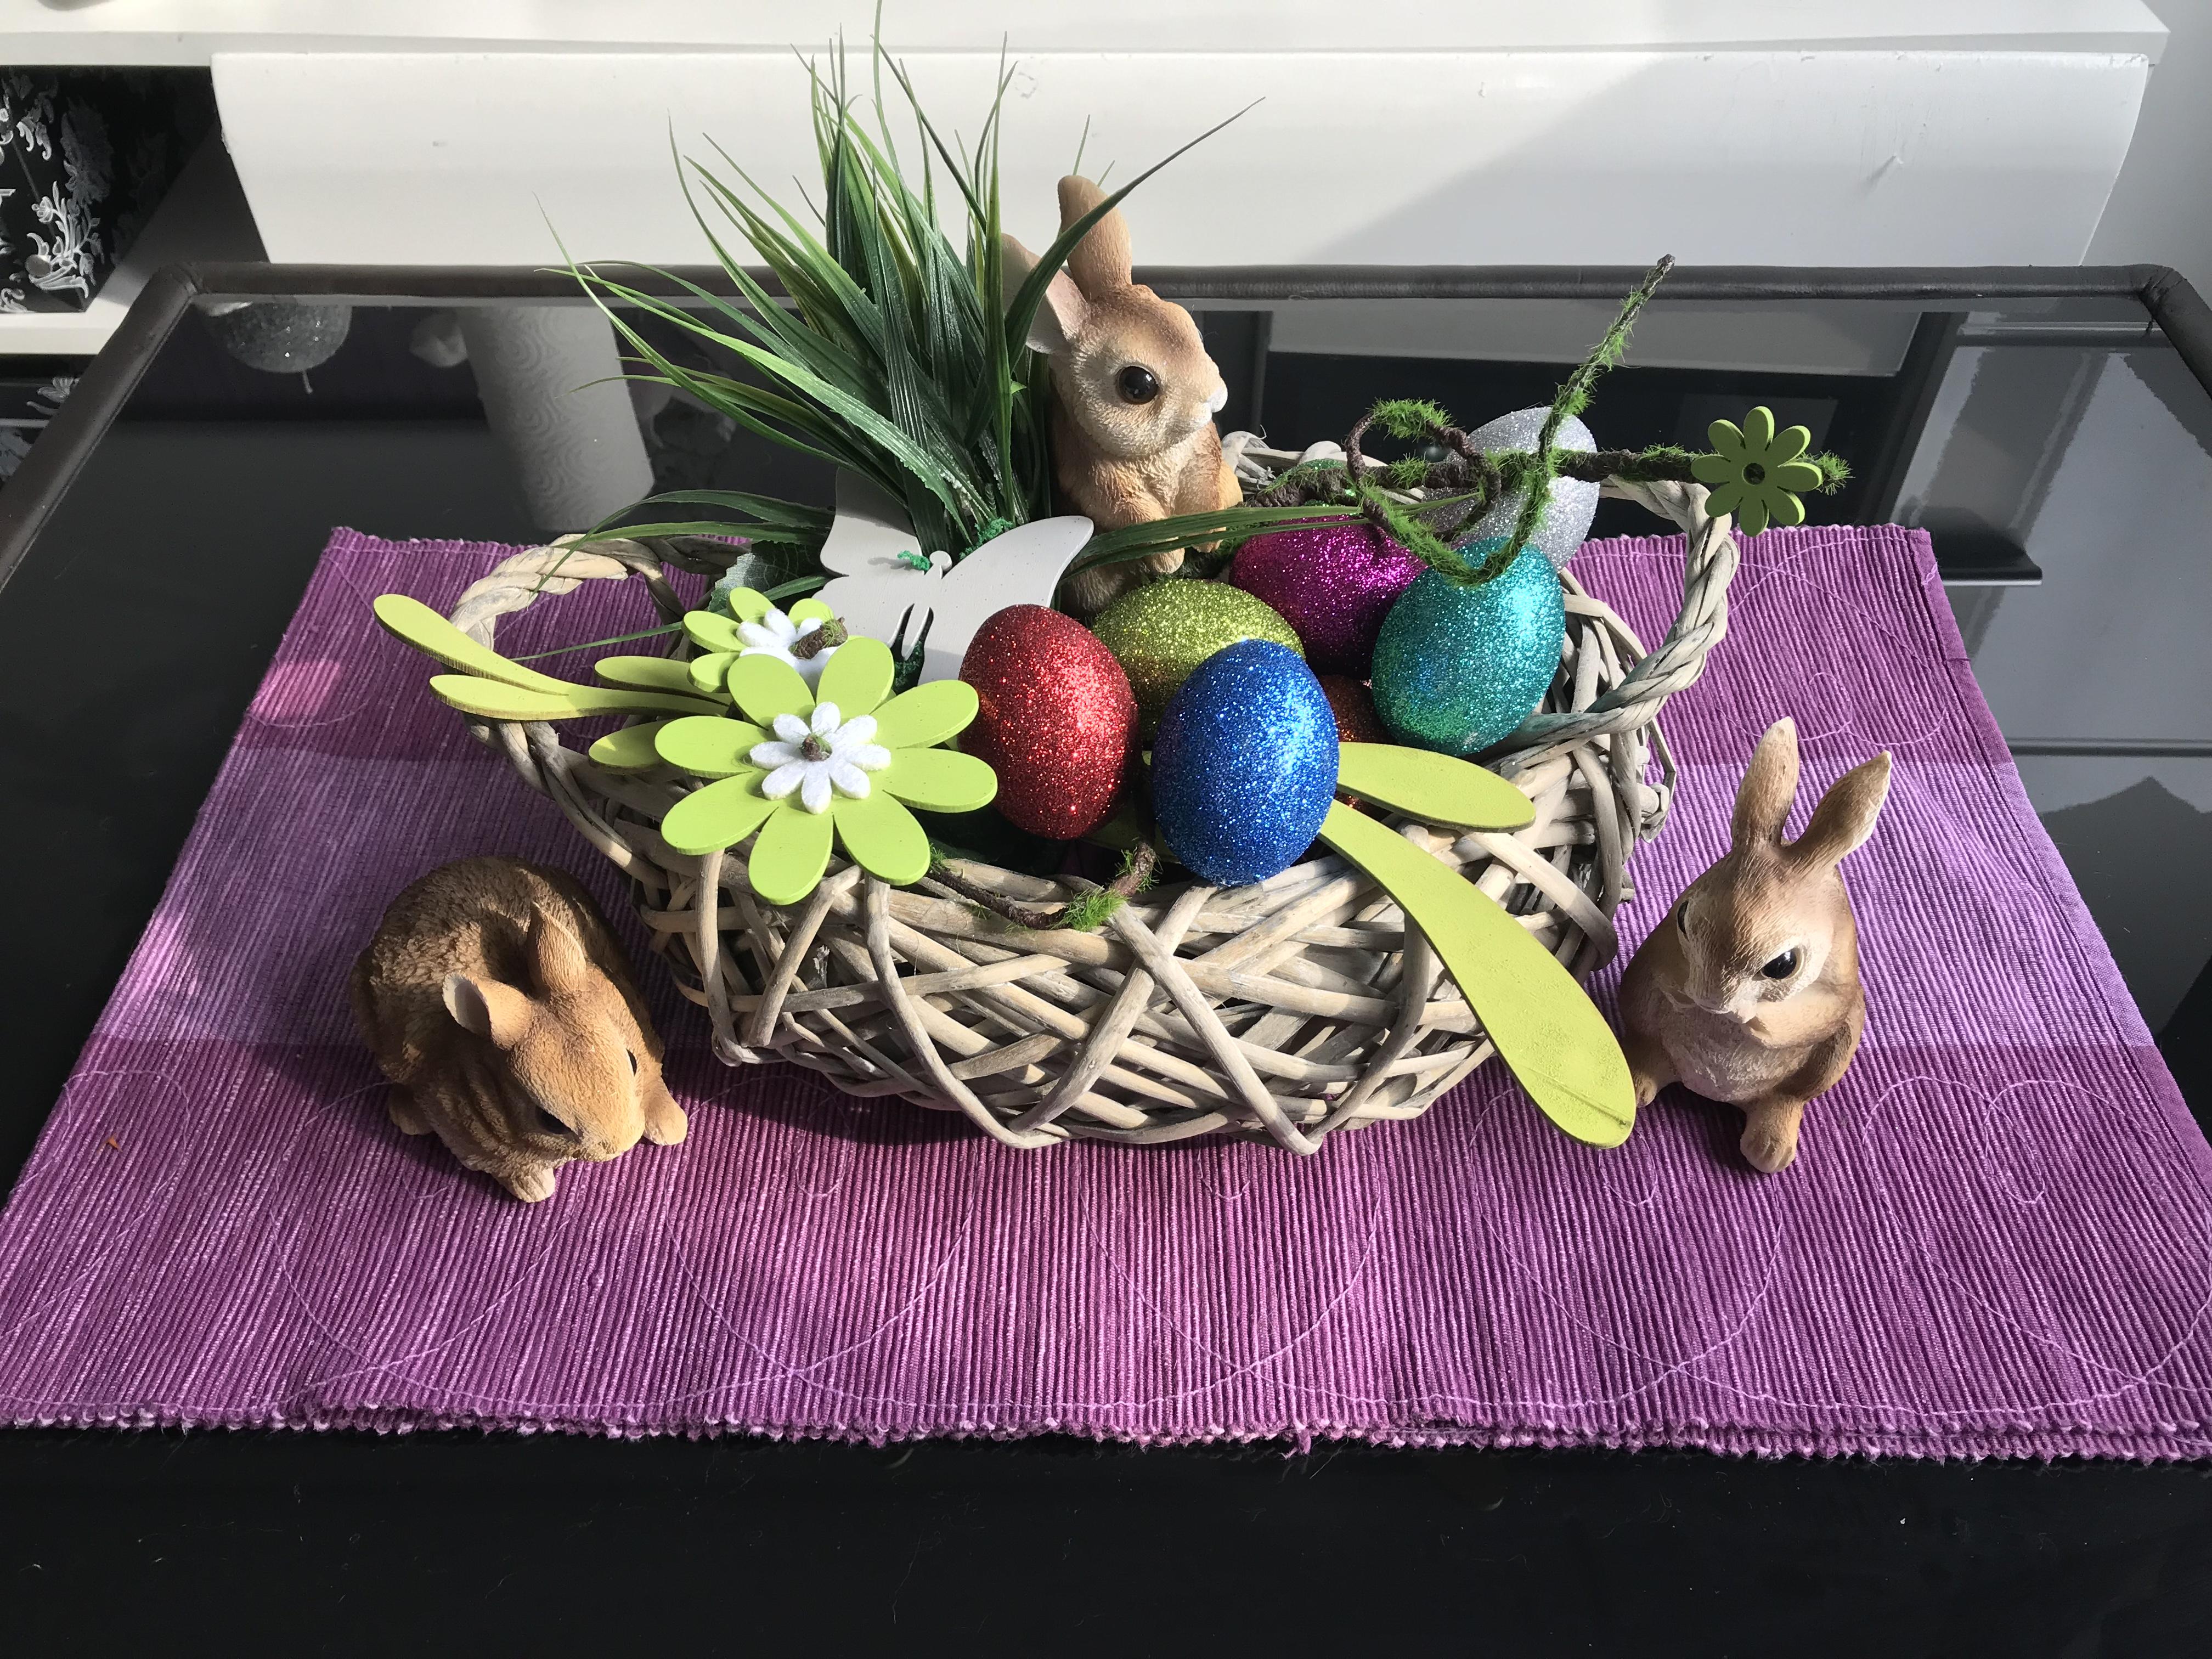 Bastelset Glitzer Eier Osterei mit Kleber,1 Pinsel,12 Glitzer,4 Holzstäbe Ostern DIY Basteln